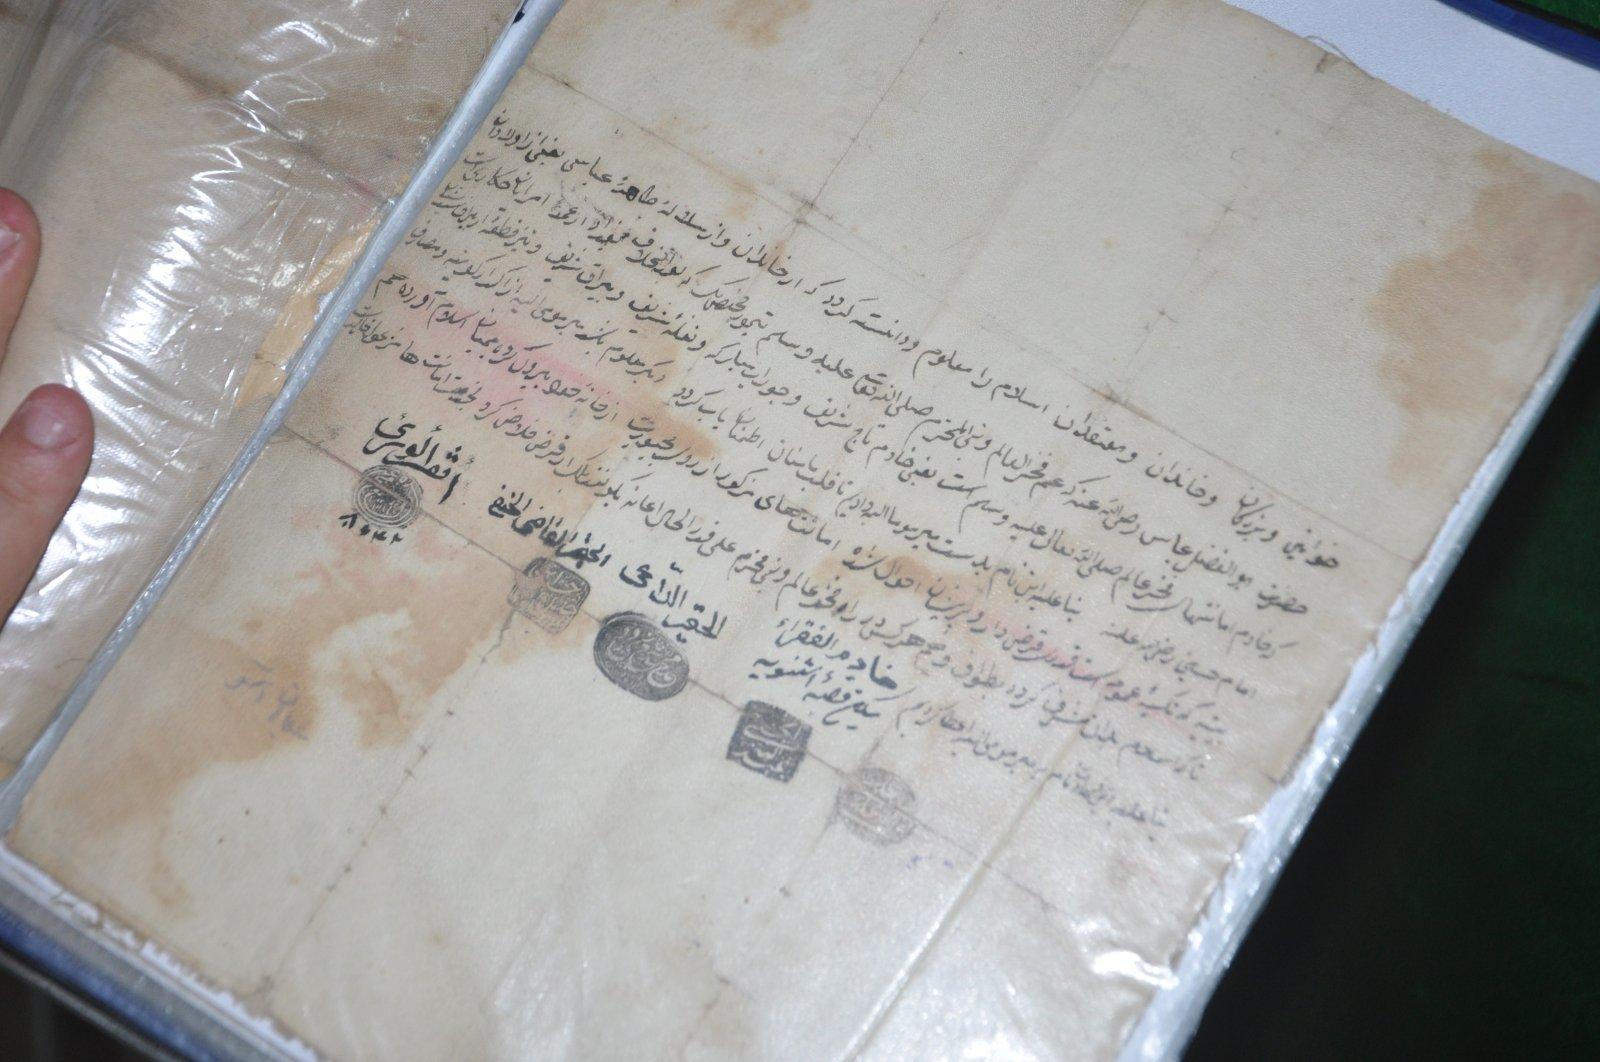 A manuscript belonging to Prophet Muhammad is kept at the home of Abdurrahim Sakin, Hakkari, southeastern Turkey, Feb. 10, 2021. (IHA Photo).